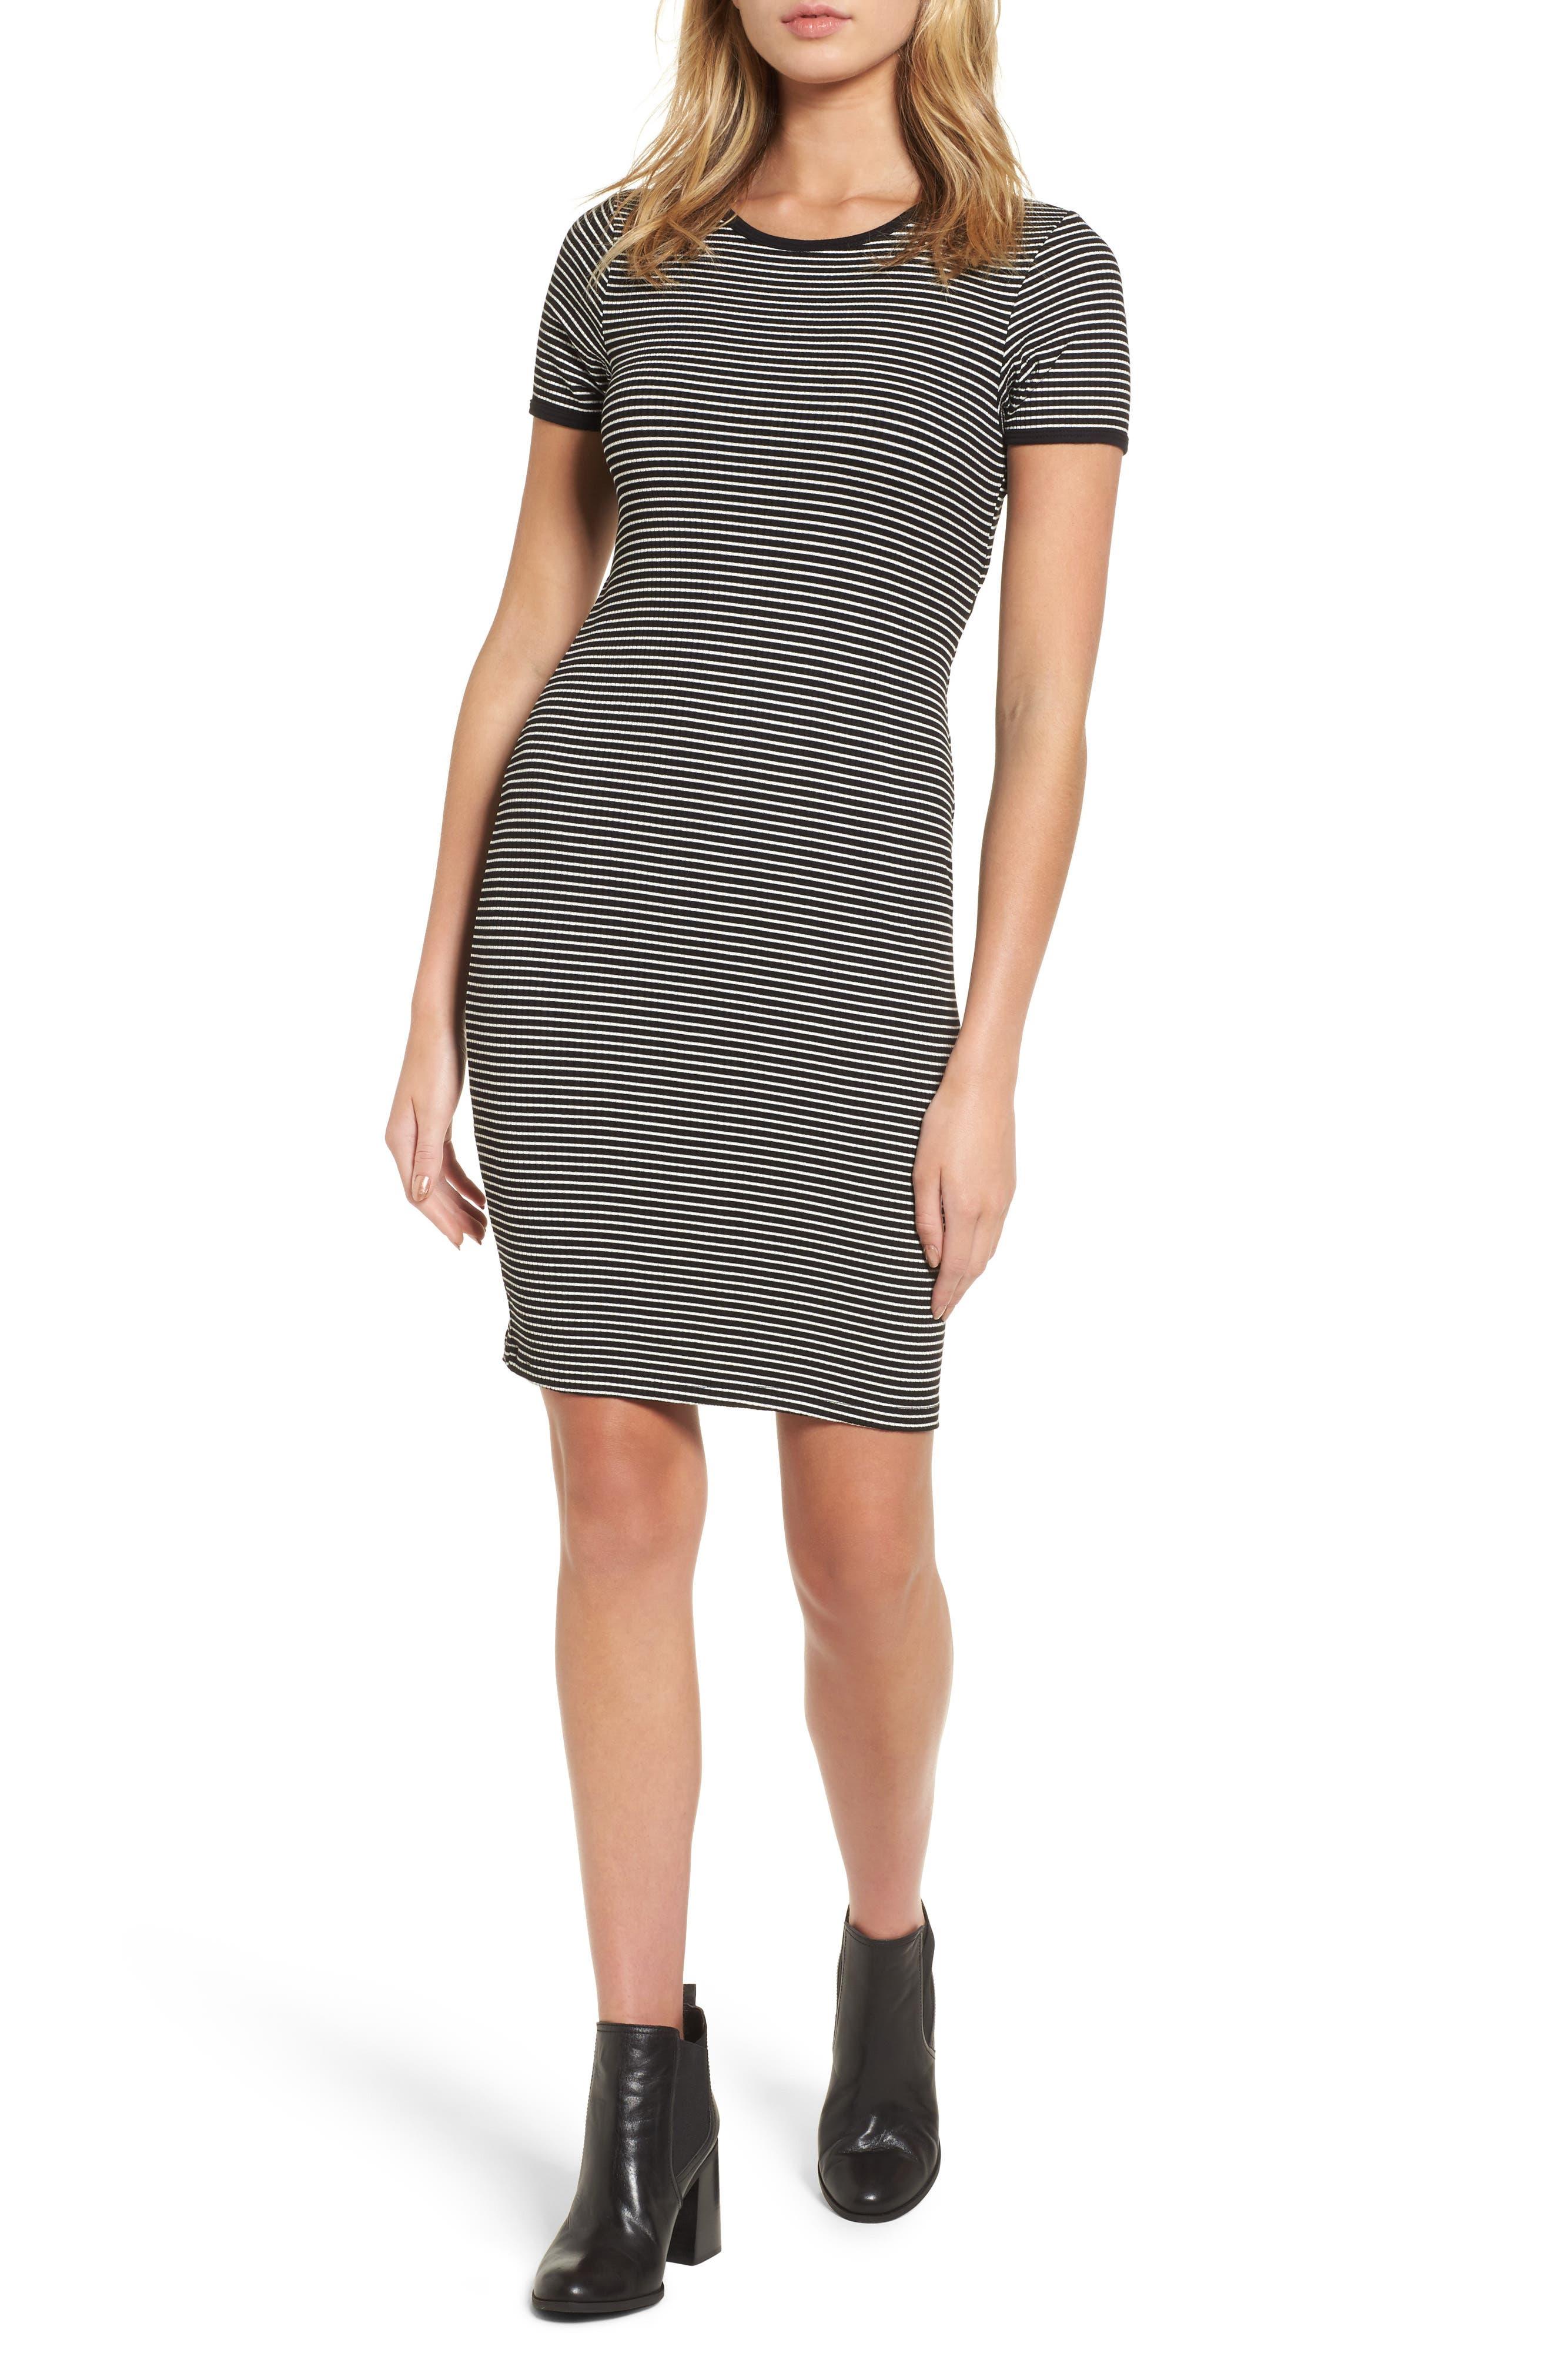 Main Image - PST by Project Social T Cutout Stripe T-Shirt Dress